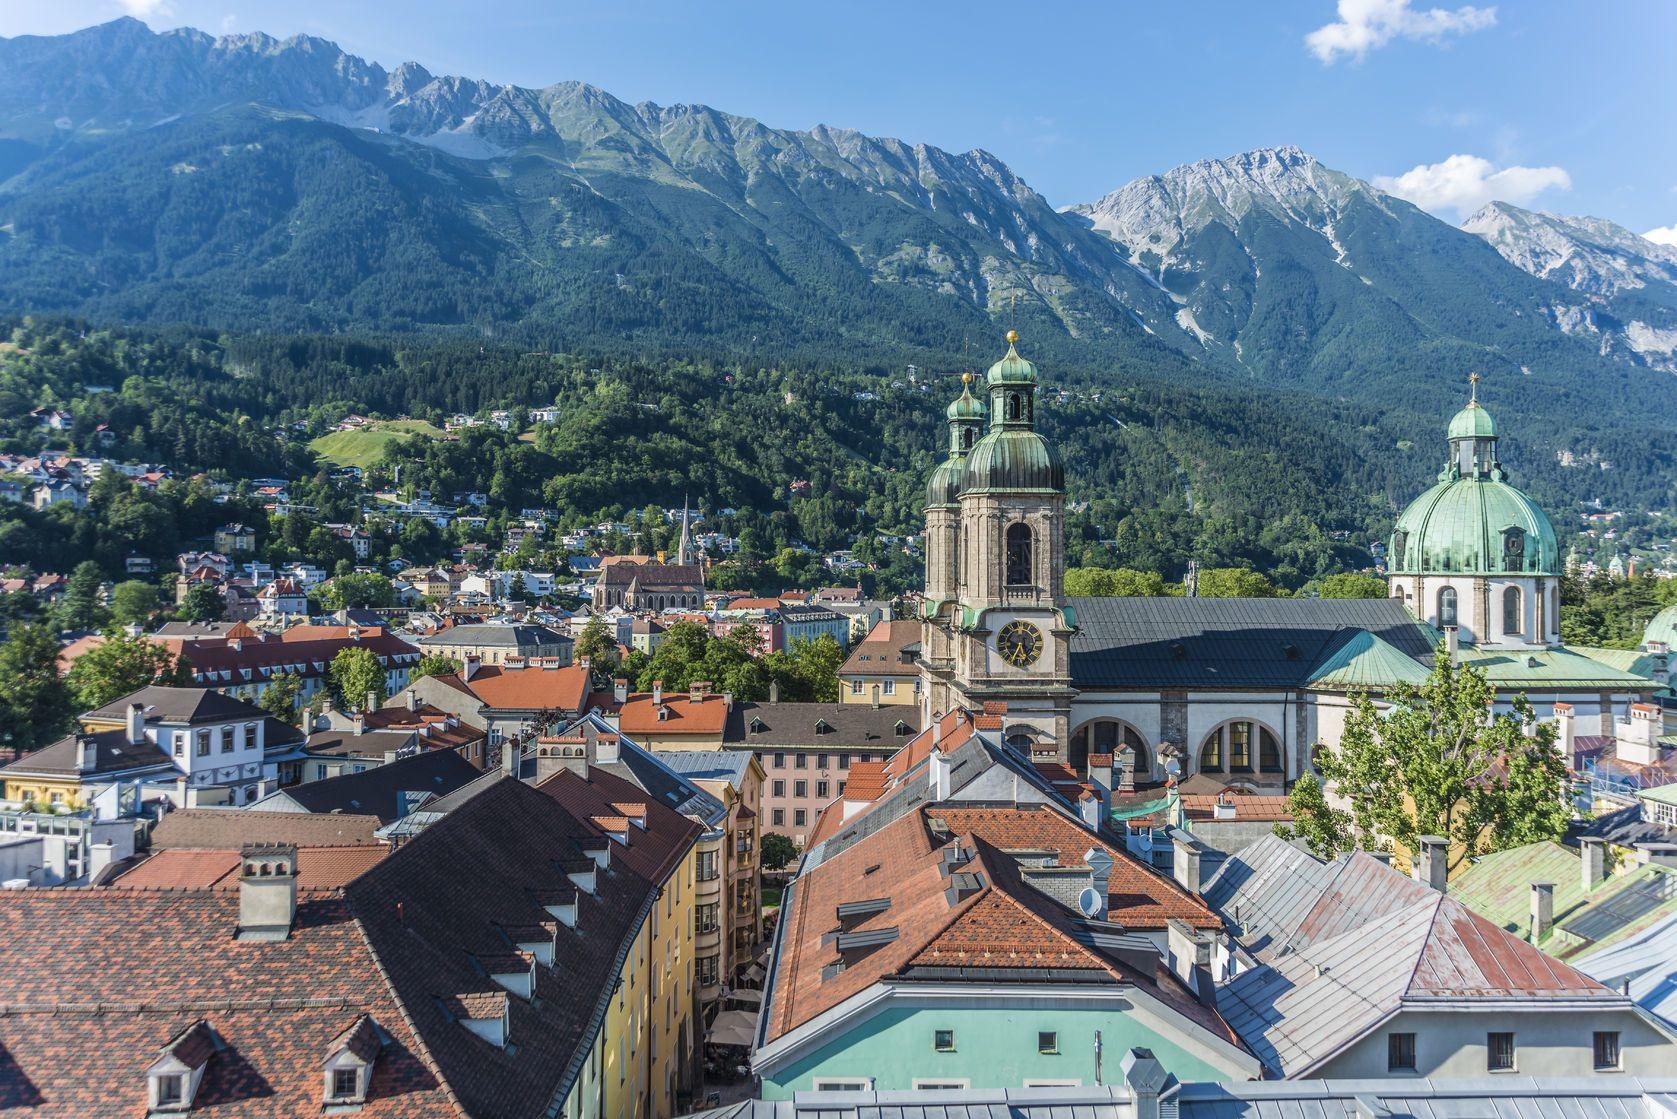 Pohled na Innsbruck v Rakousku | anibaltrejo/123RF.com